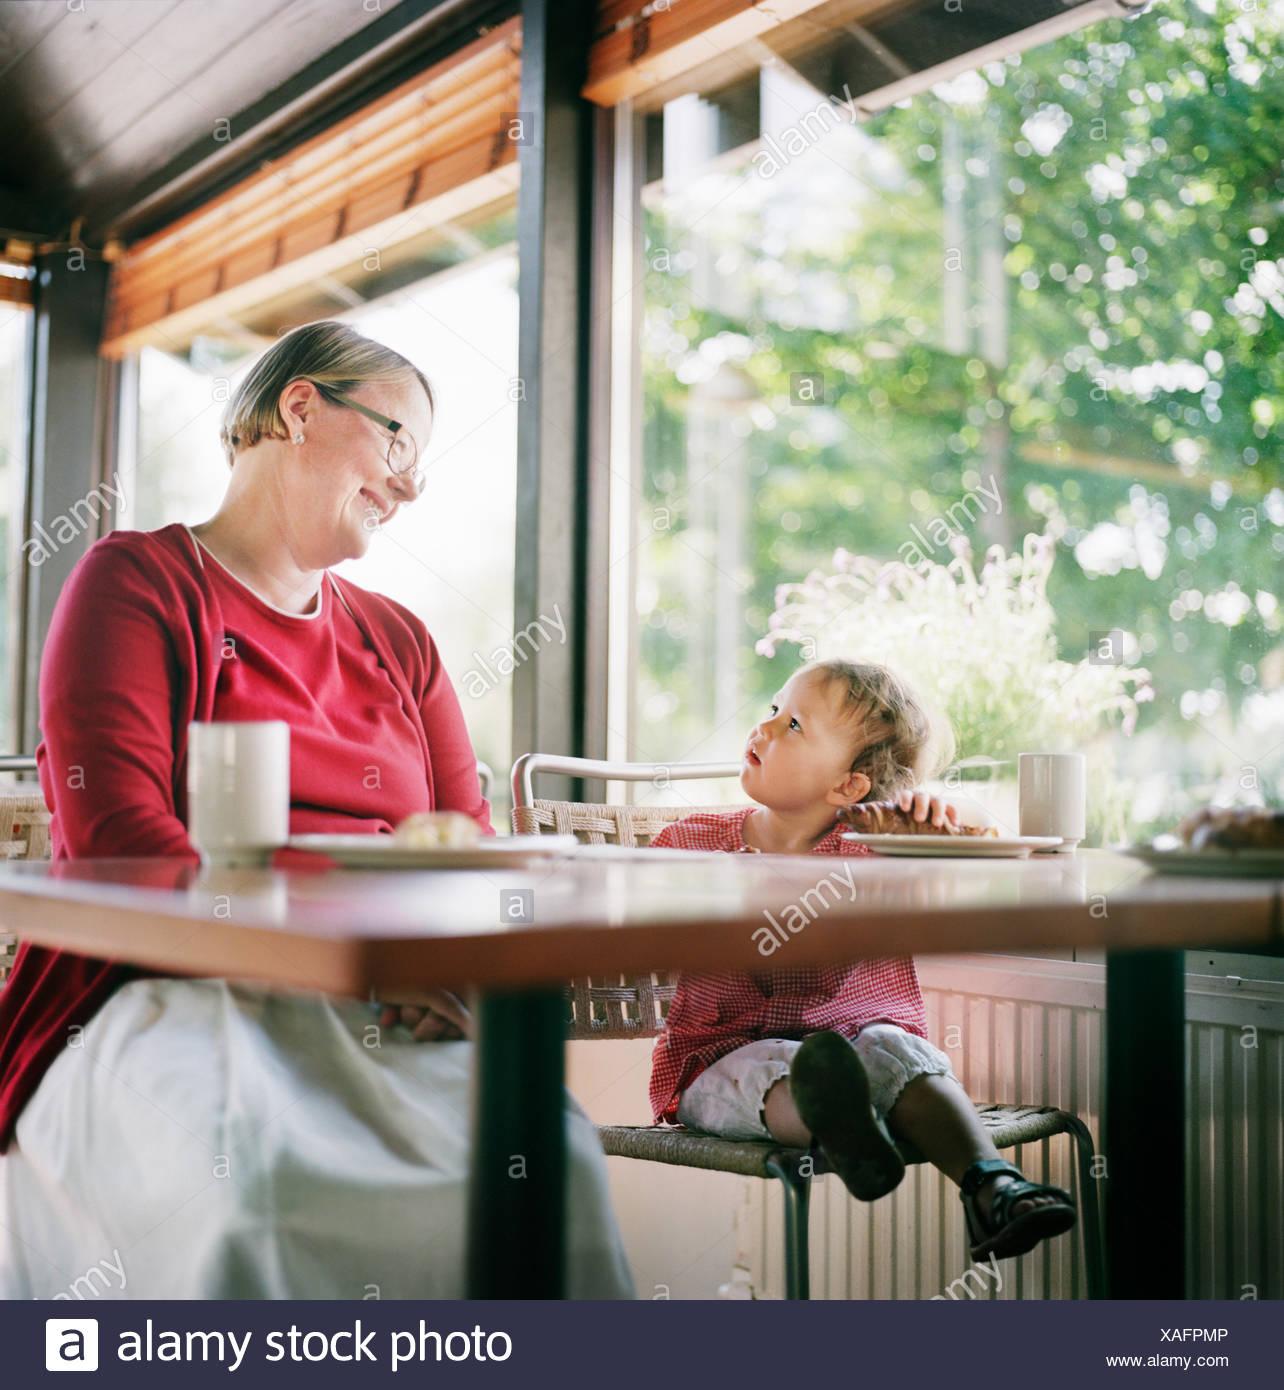 La Finlande, Helsinki, Uusimaa, grand-mère et petite-fille (2-3) relaxing in cafe Photo Stock